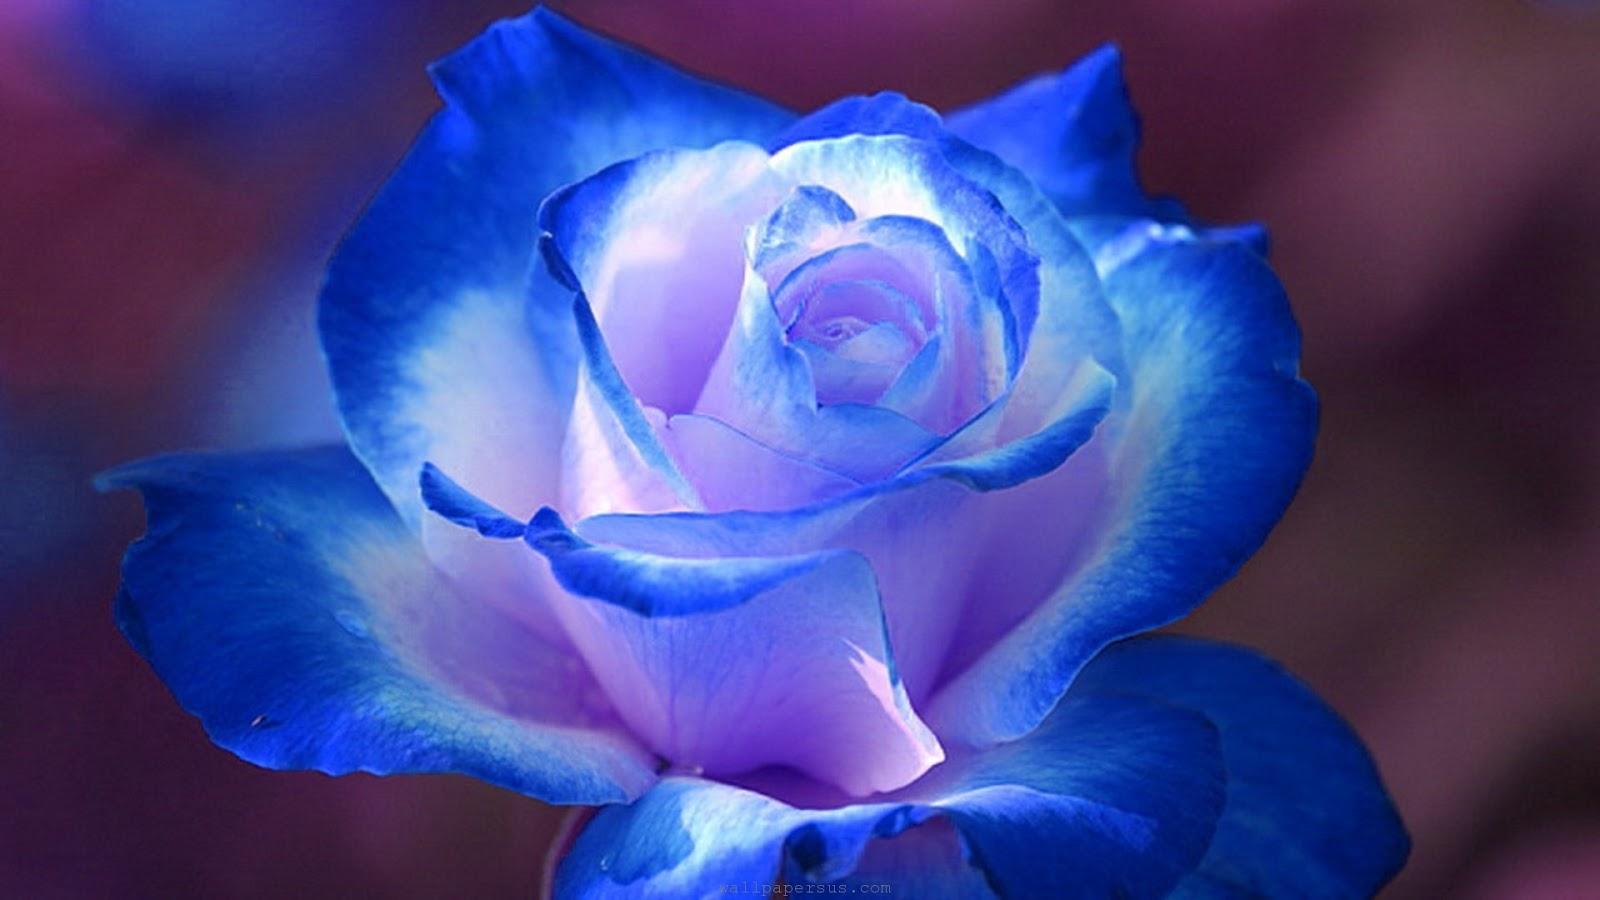 Flowers roses blue